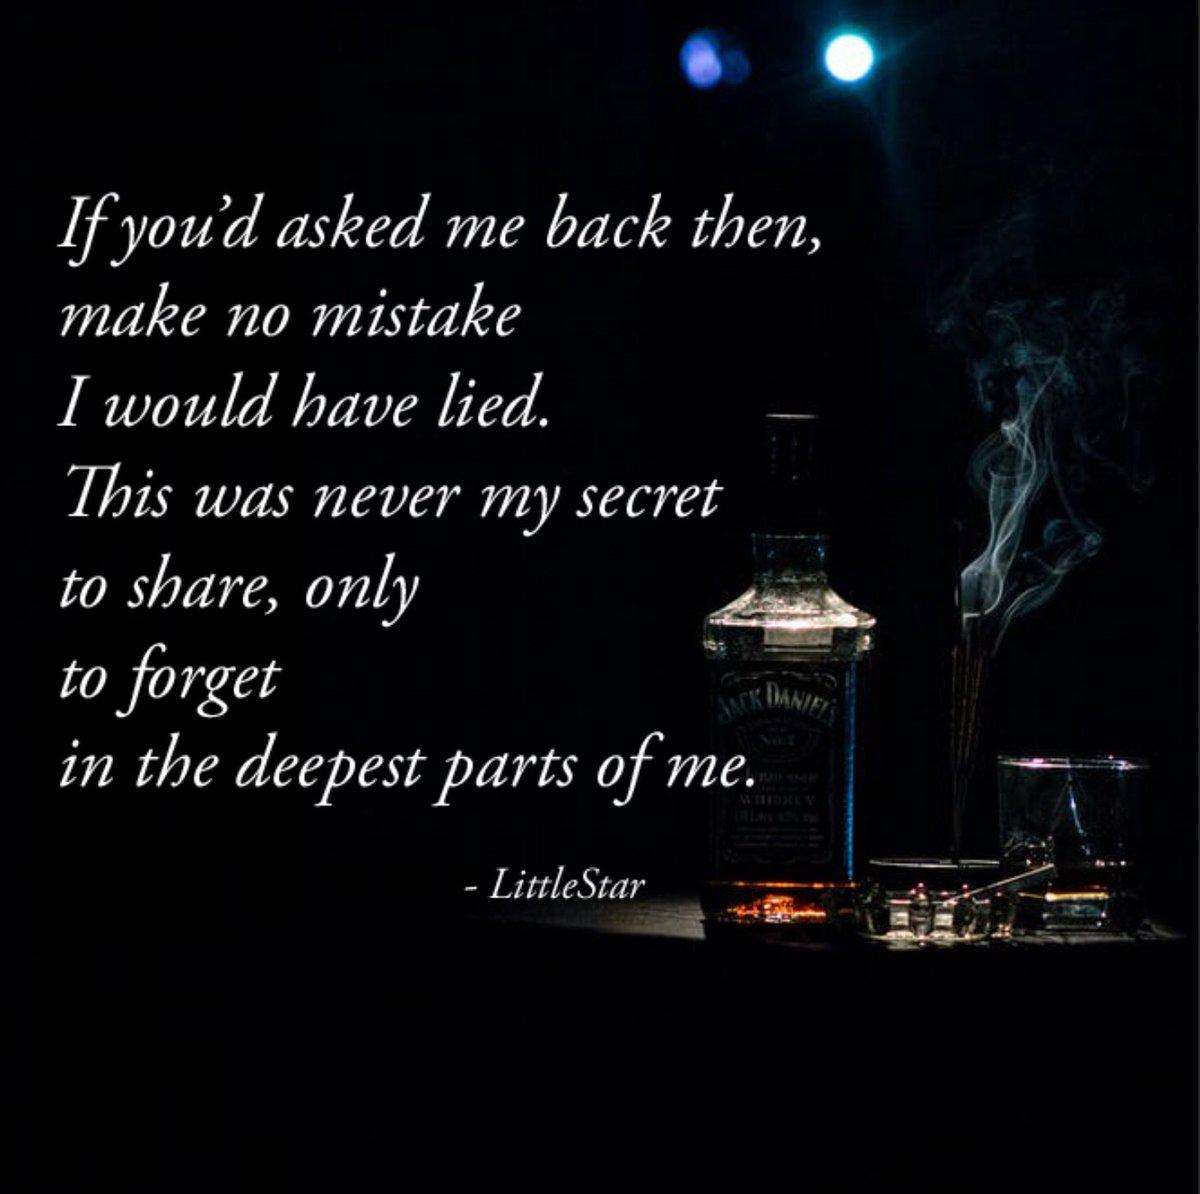 #instapoetry #poem #poetry #writing #writer #poetsofinstagram #micropoetry #poemoftheday #poetryisnotdead #littlestar_writes #quotes #poetstribe #writersflare #quoteoftheday #soulmate #dailycalm #addiction #jackdaniels https://www.instagram.com/p/CDcPnhTFGss/?igshid=lmwxwo6z0f88…pic.twitter.com/RtRyhCOVjP